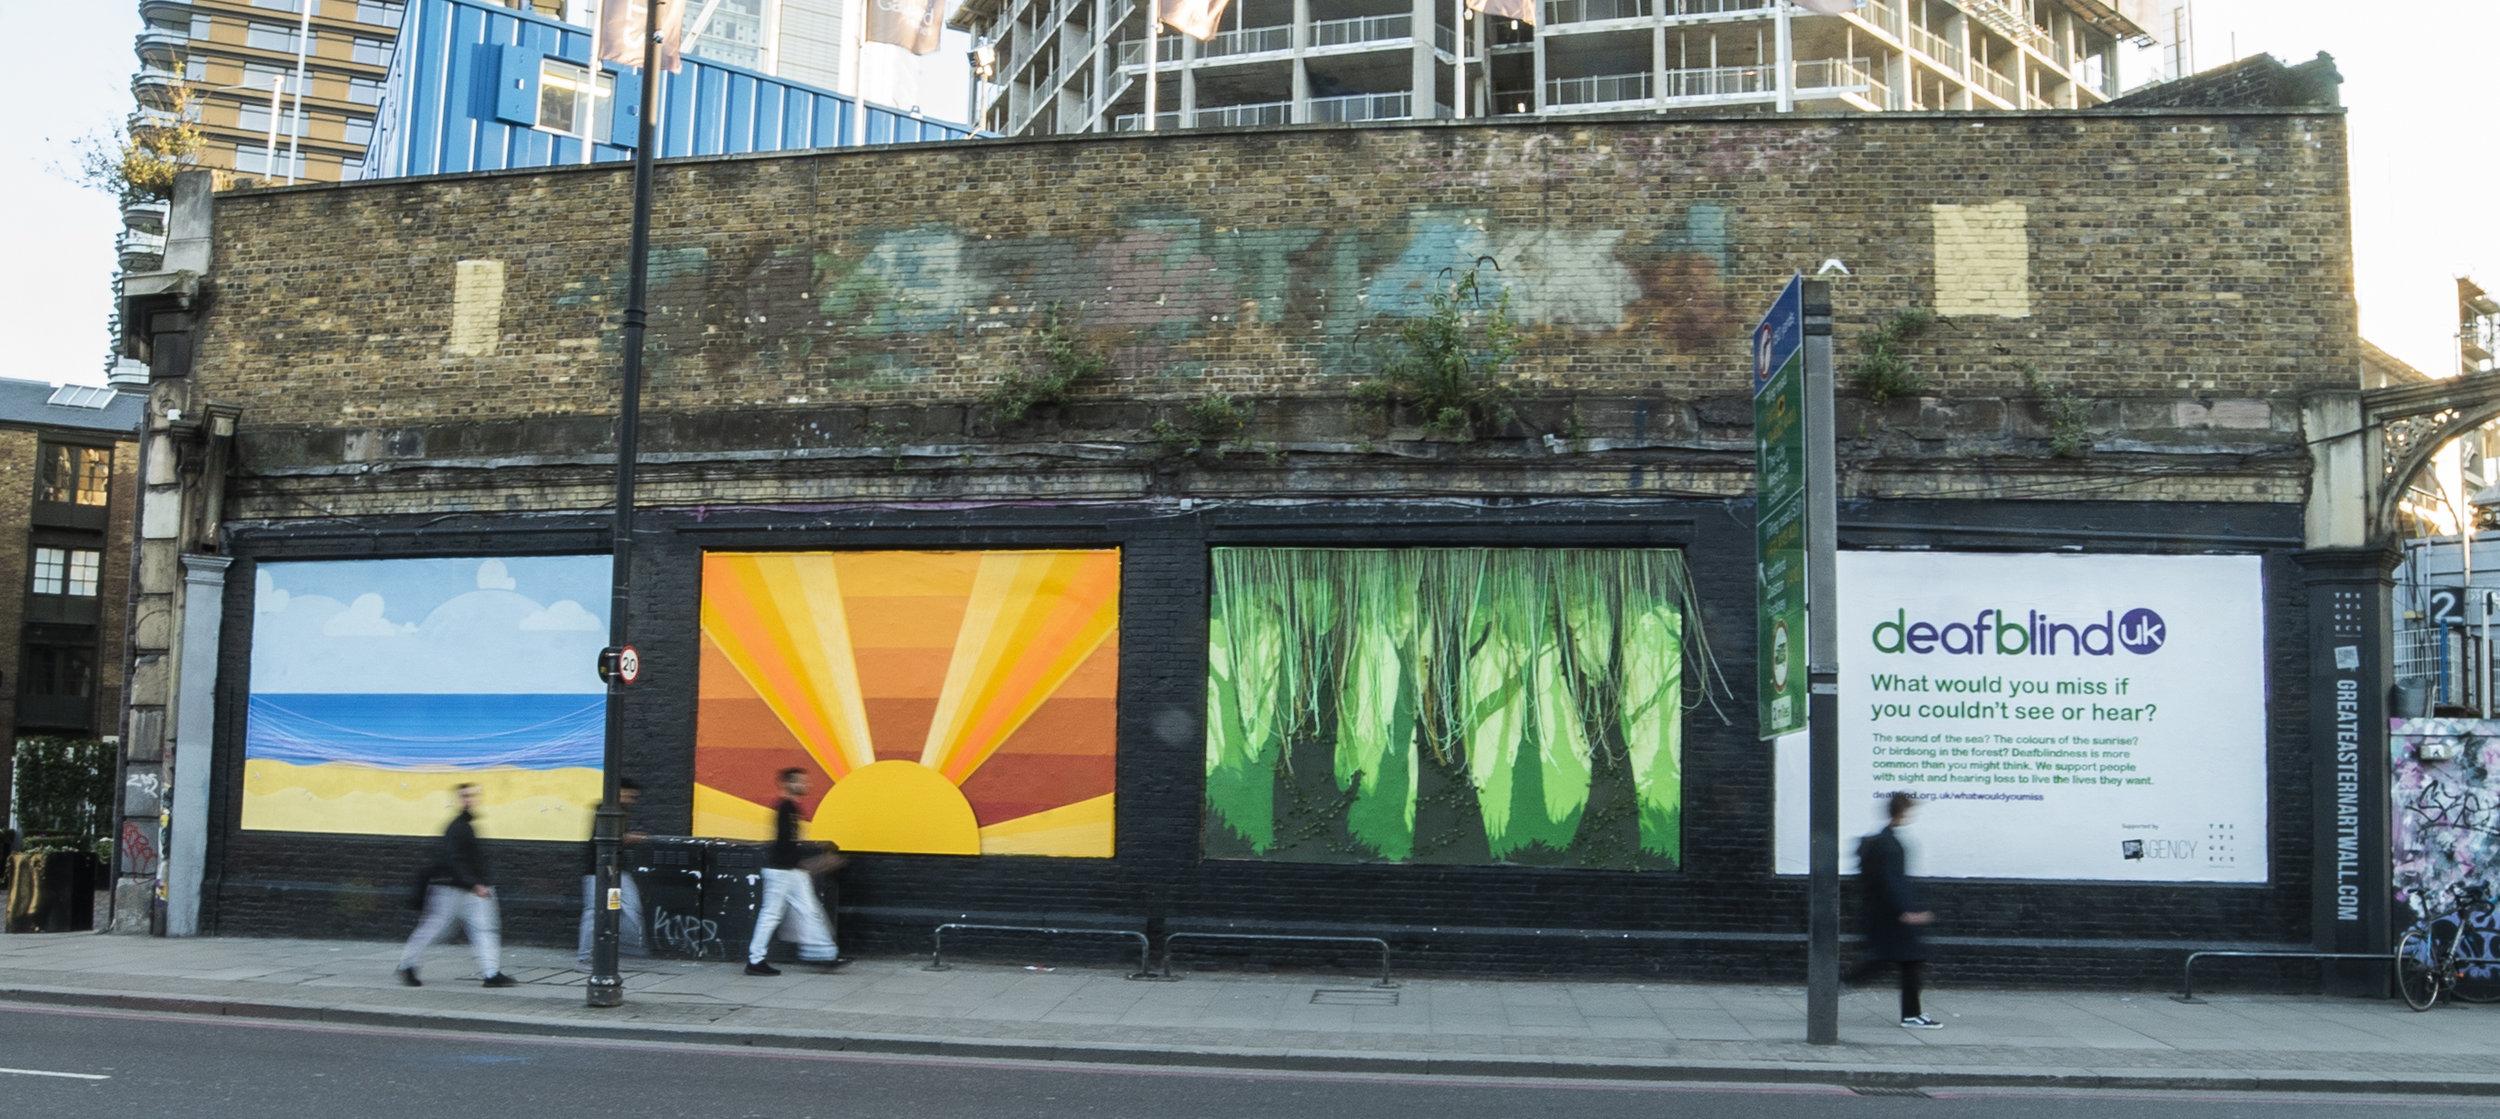 Deafblind UK Mural #1.jpg